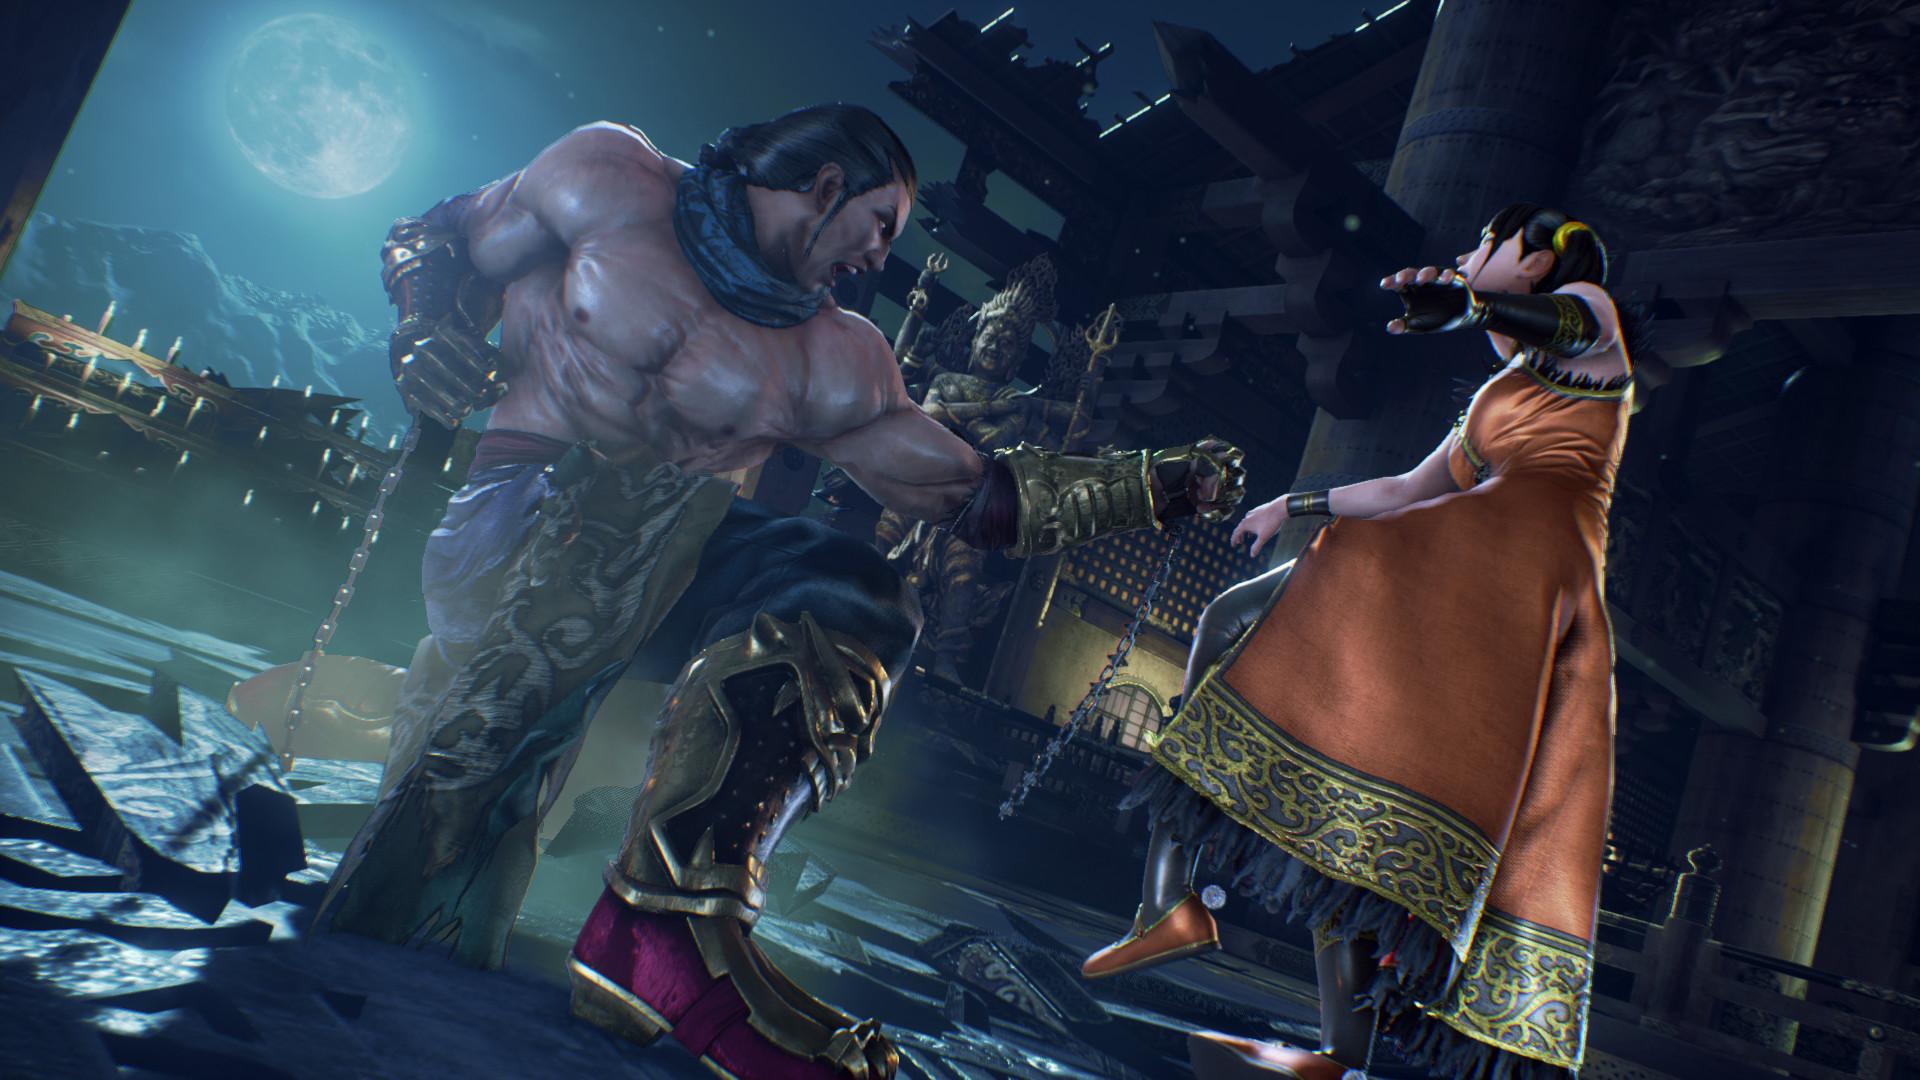 Tekken King Wallpaper (67+ images)